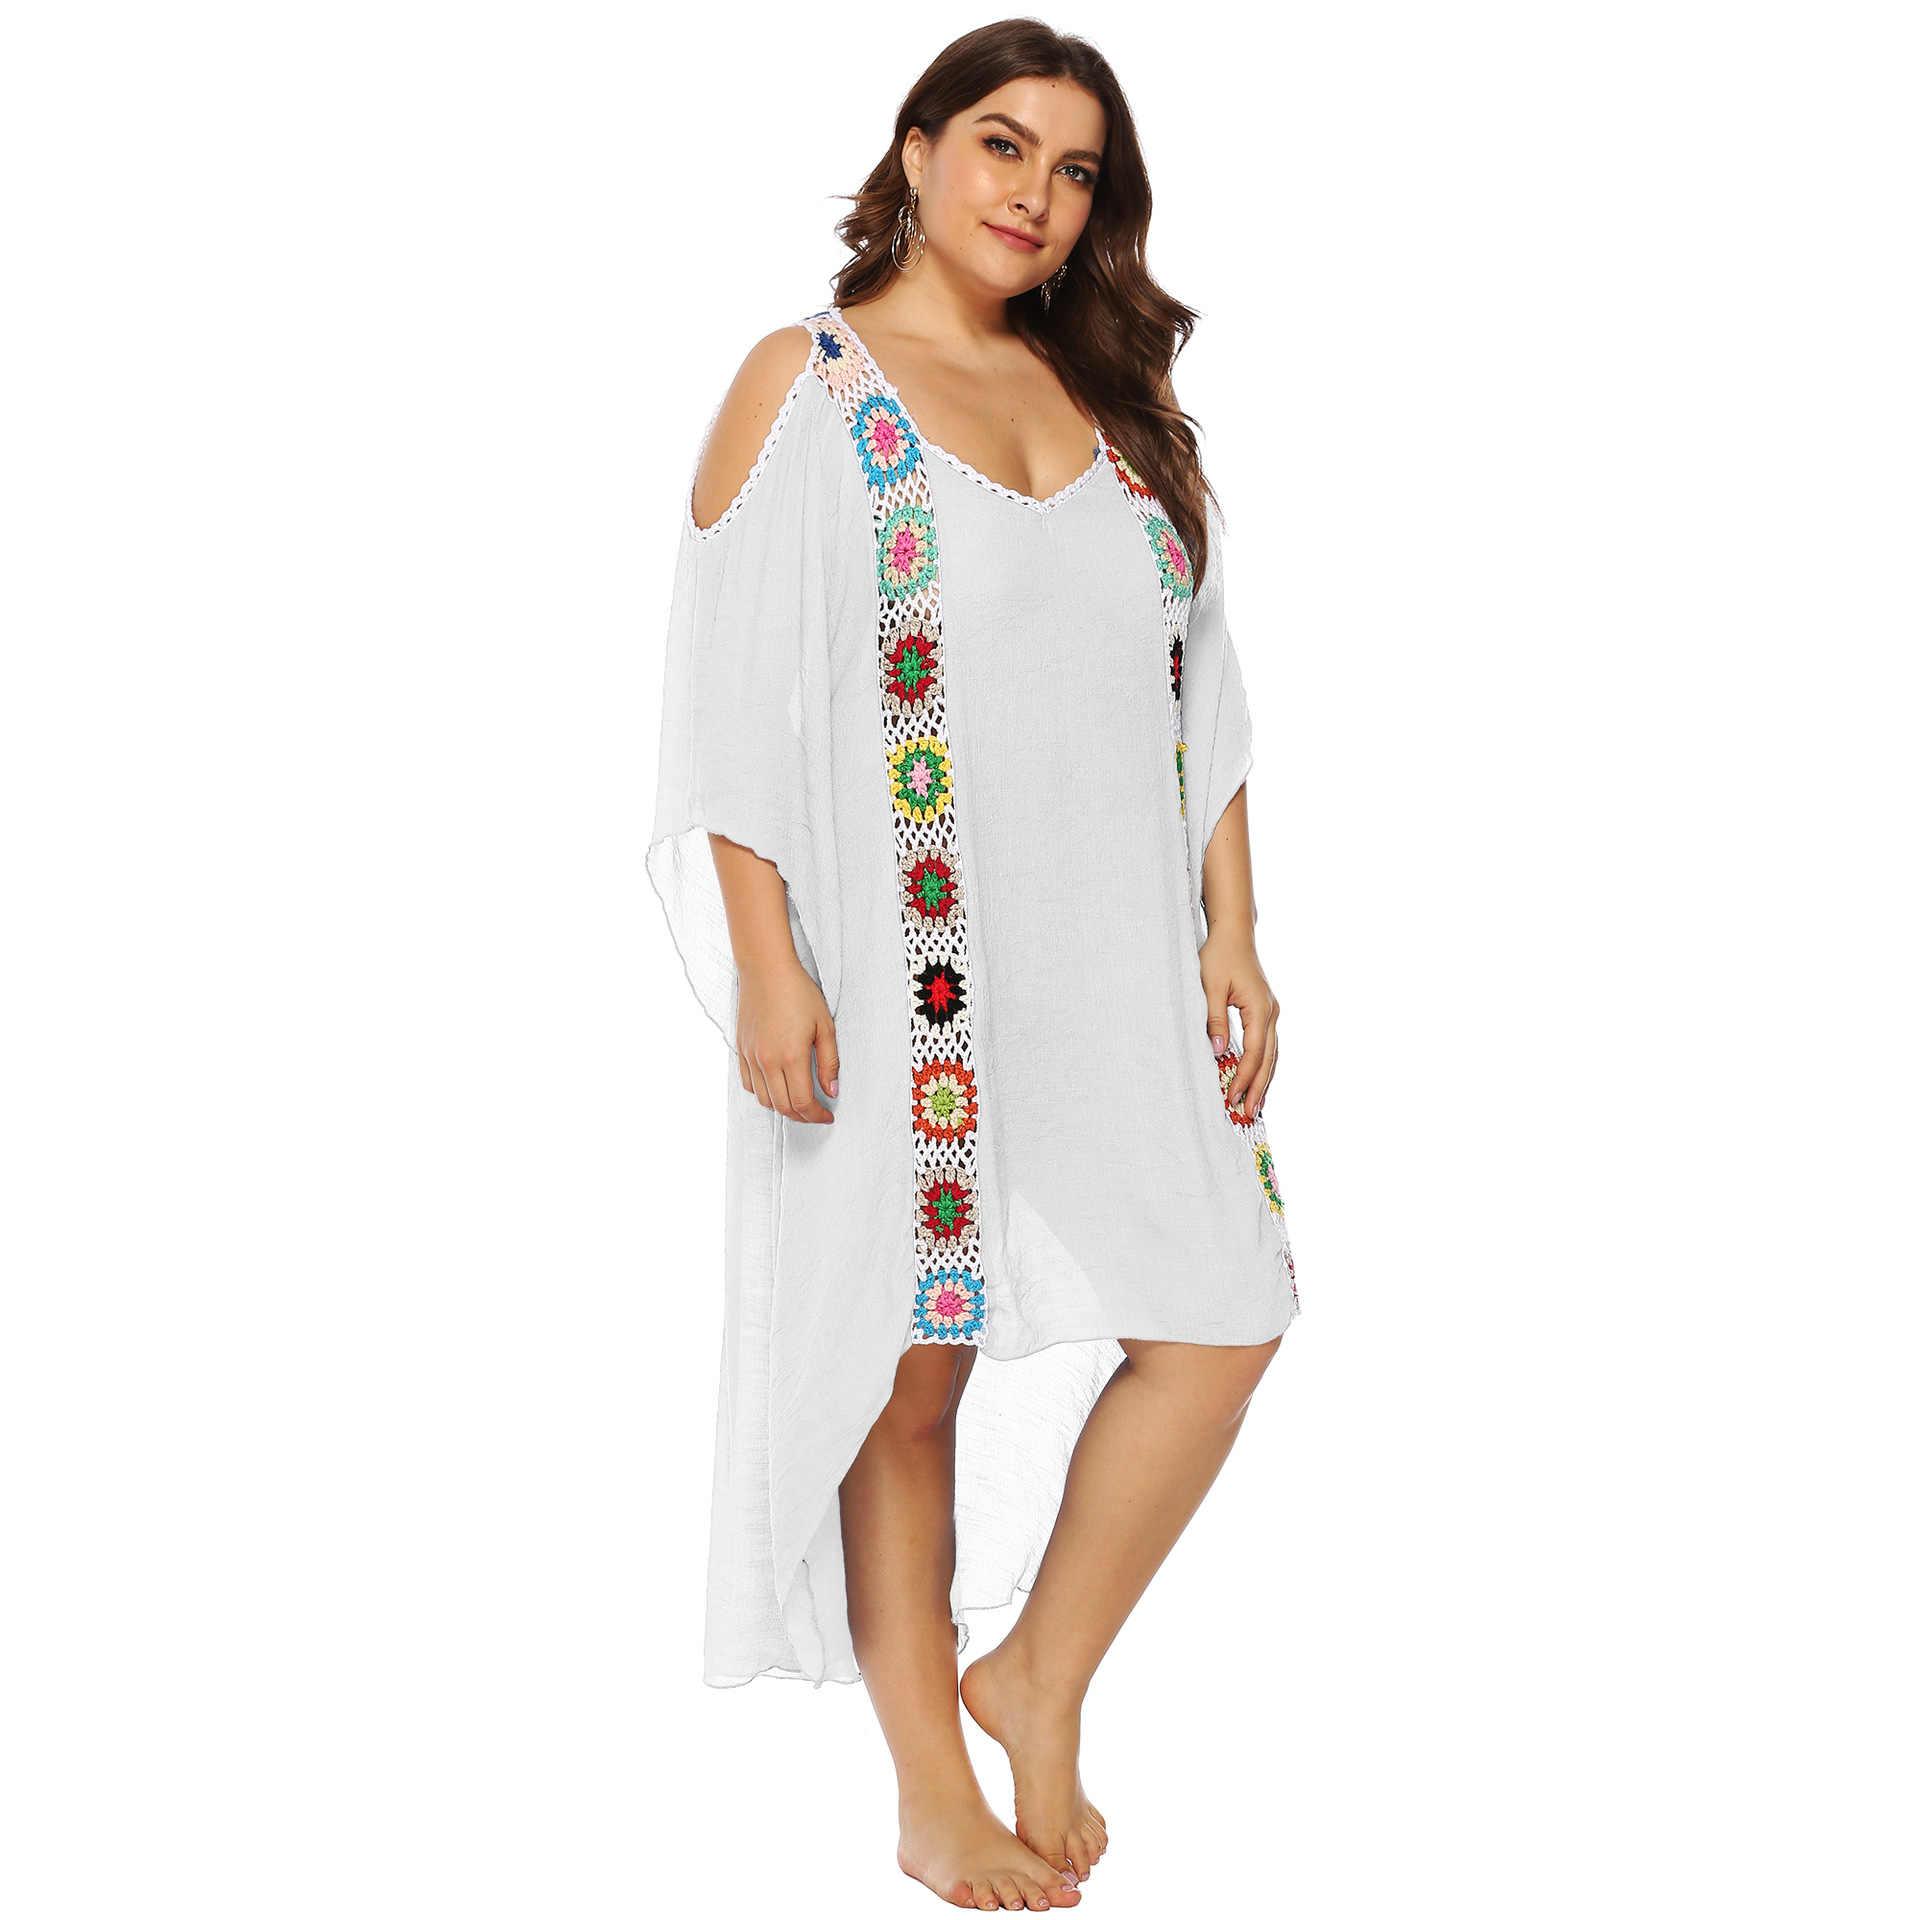 3b1ae145e8 ... Large Size Women's Hook Stitching Irregular Shore Skirt Summer Beach  Cover Up Sunscreen Tunics For Beach ...